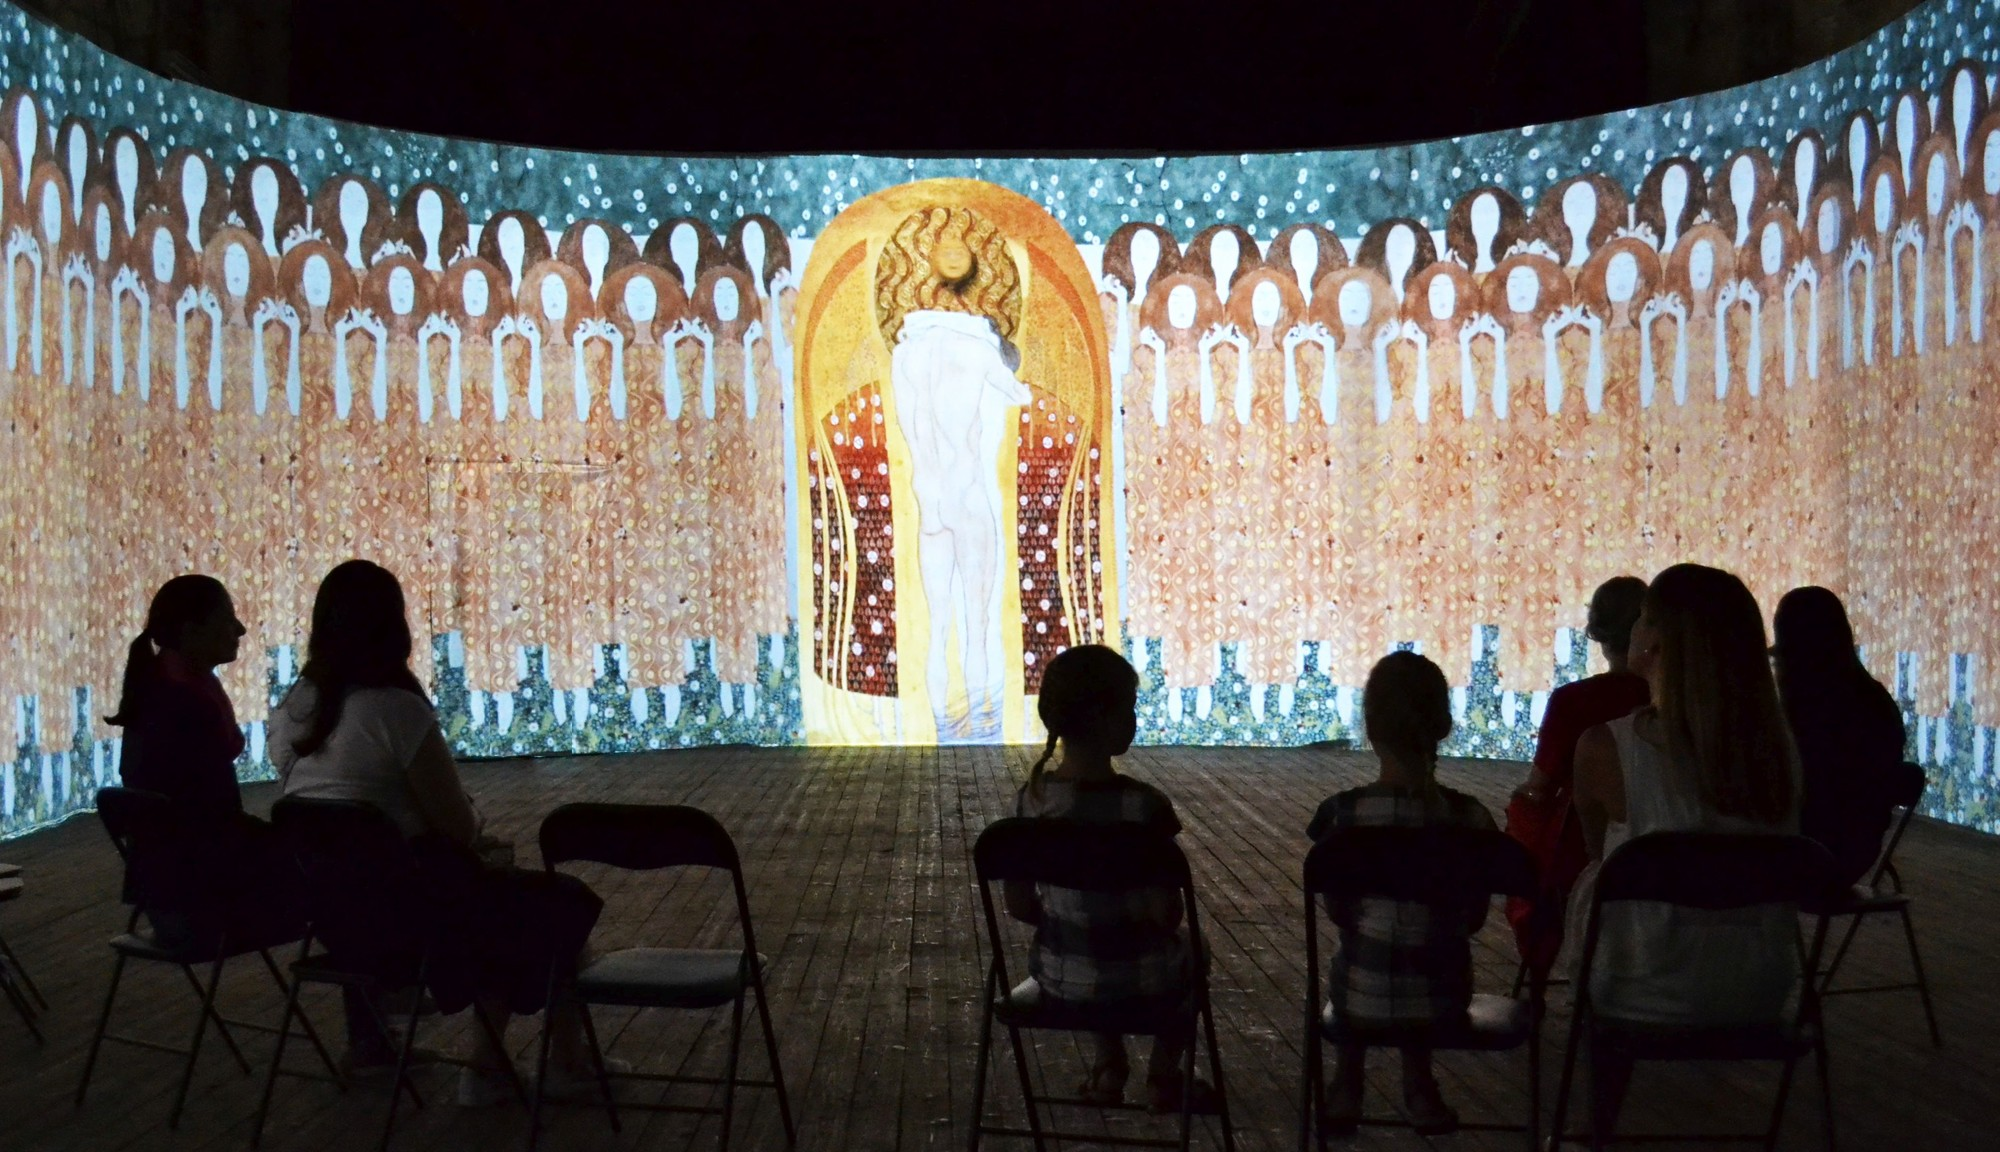 Monet2klimt Innovative Multimedia Art Exhibition Tallinn